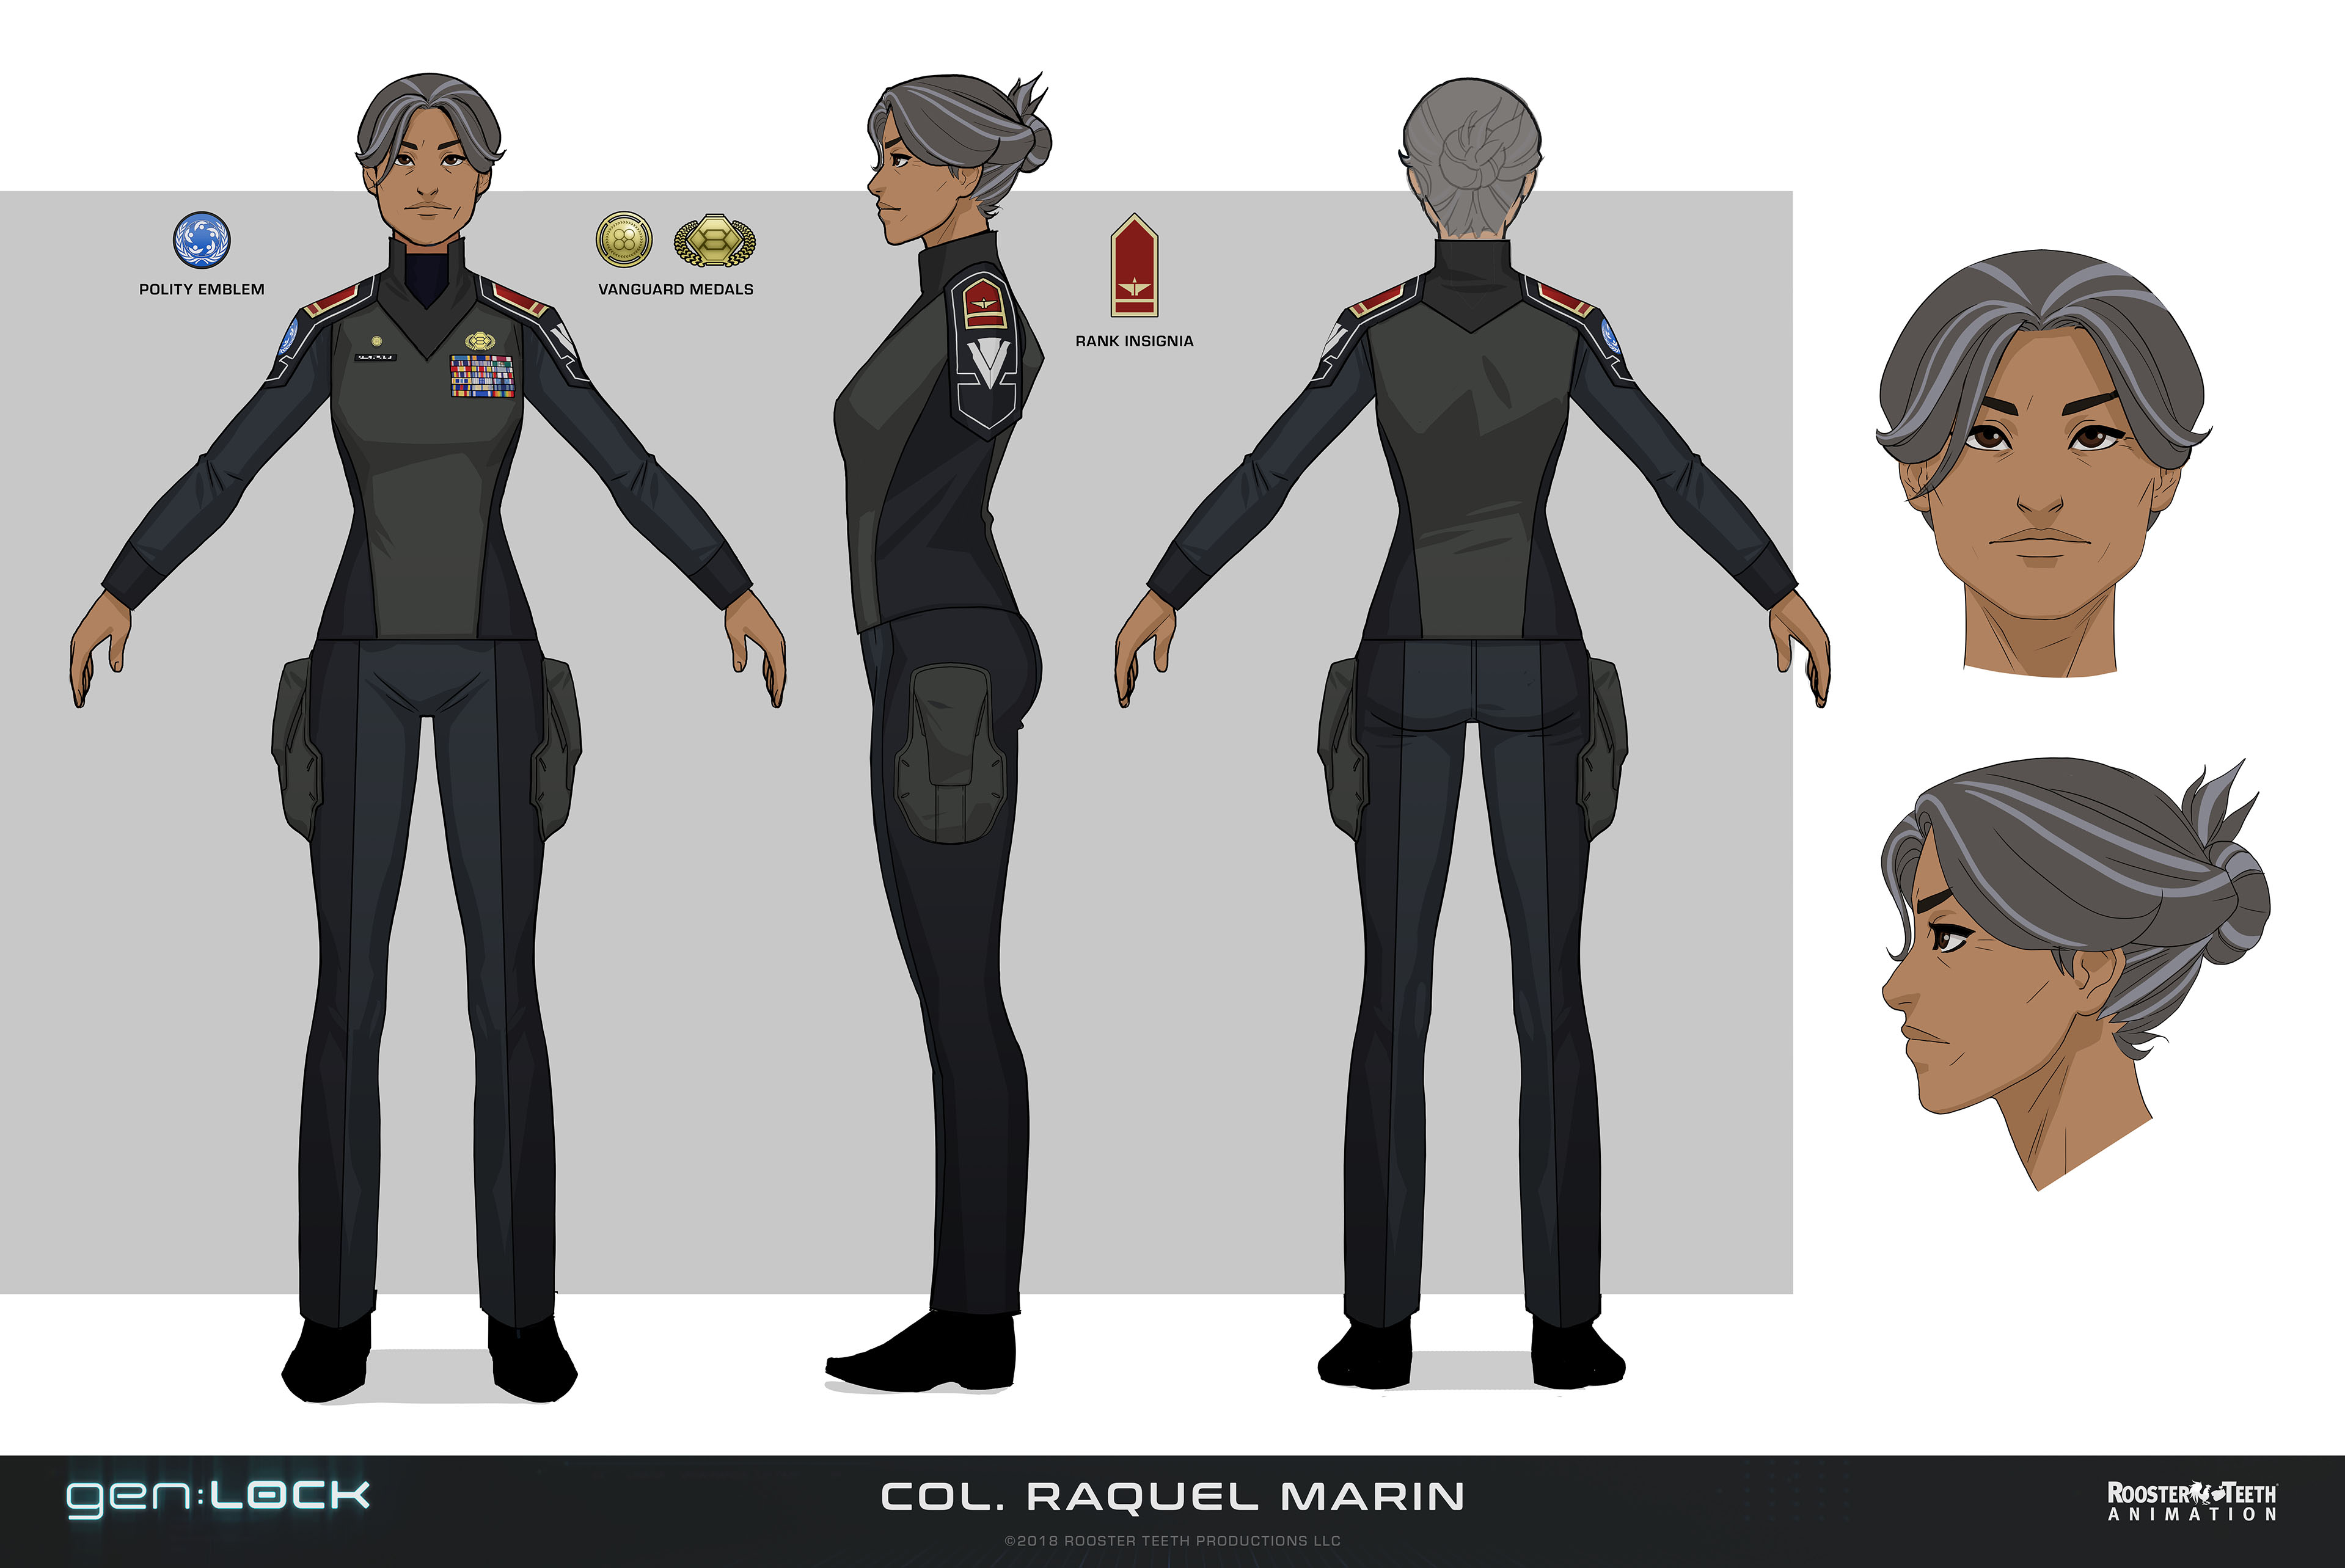 1165908-1532708813575-ColonelMarin_Final